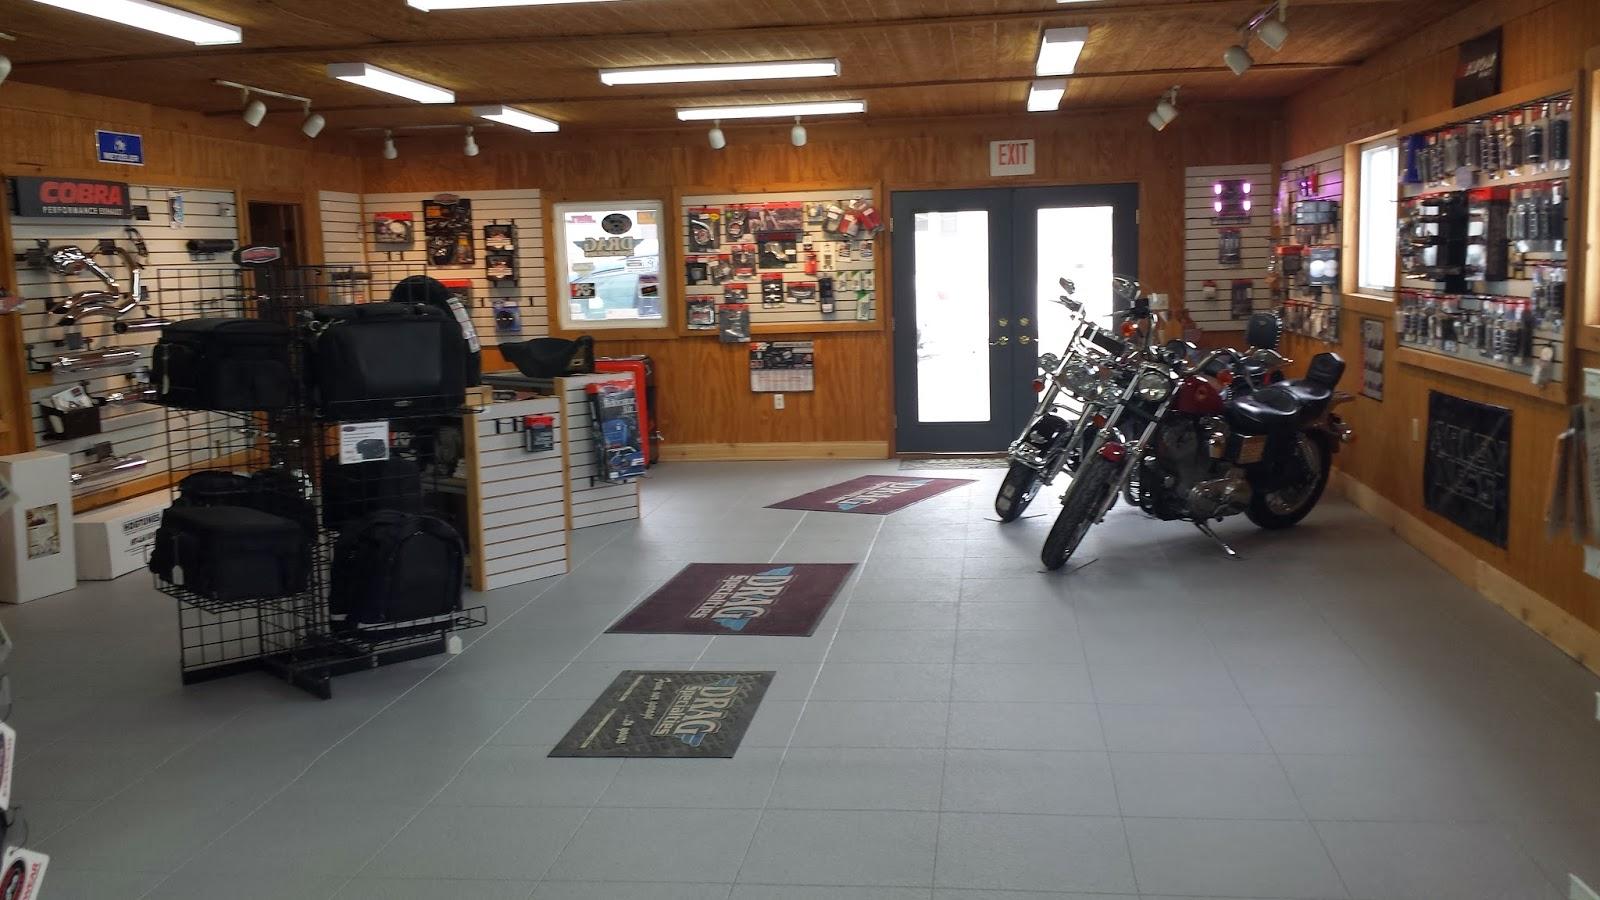 Greatmats Specialty Flooring, Mats and Tiles: Customer ...